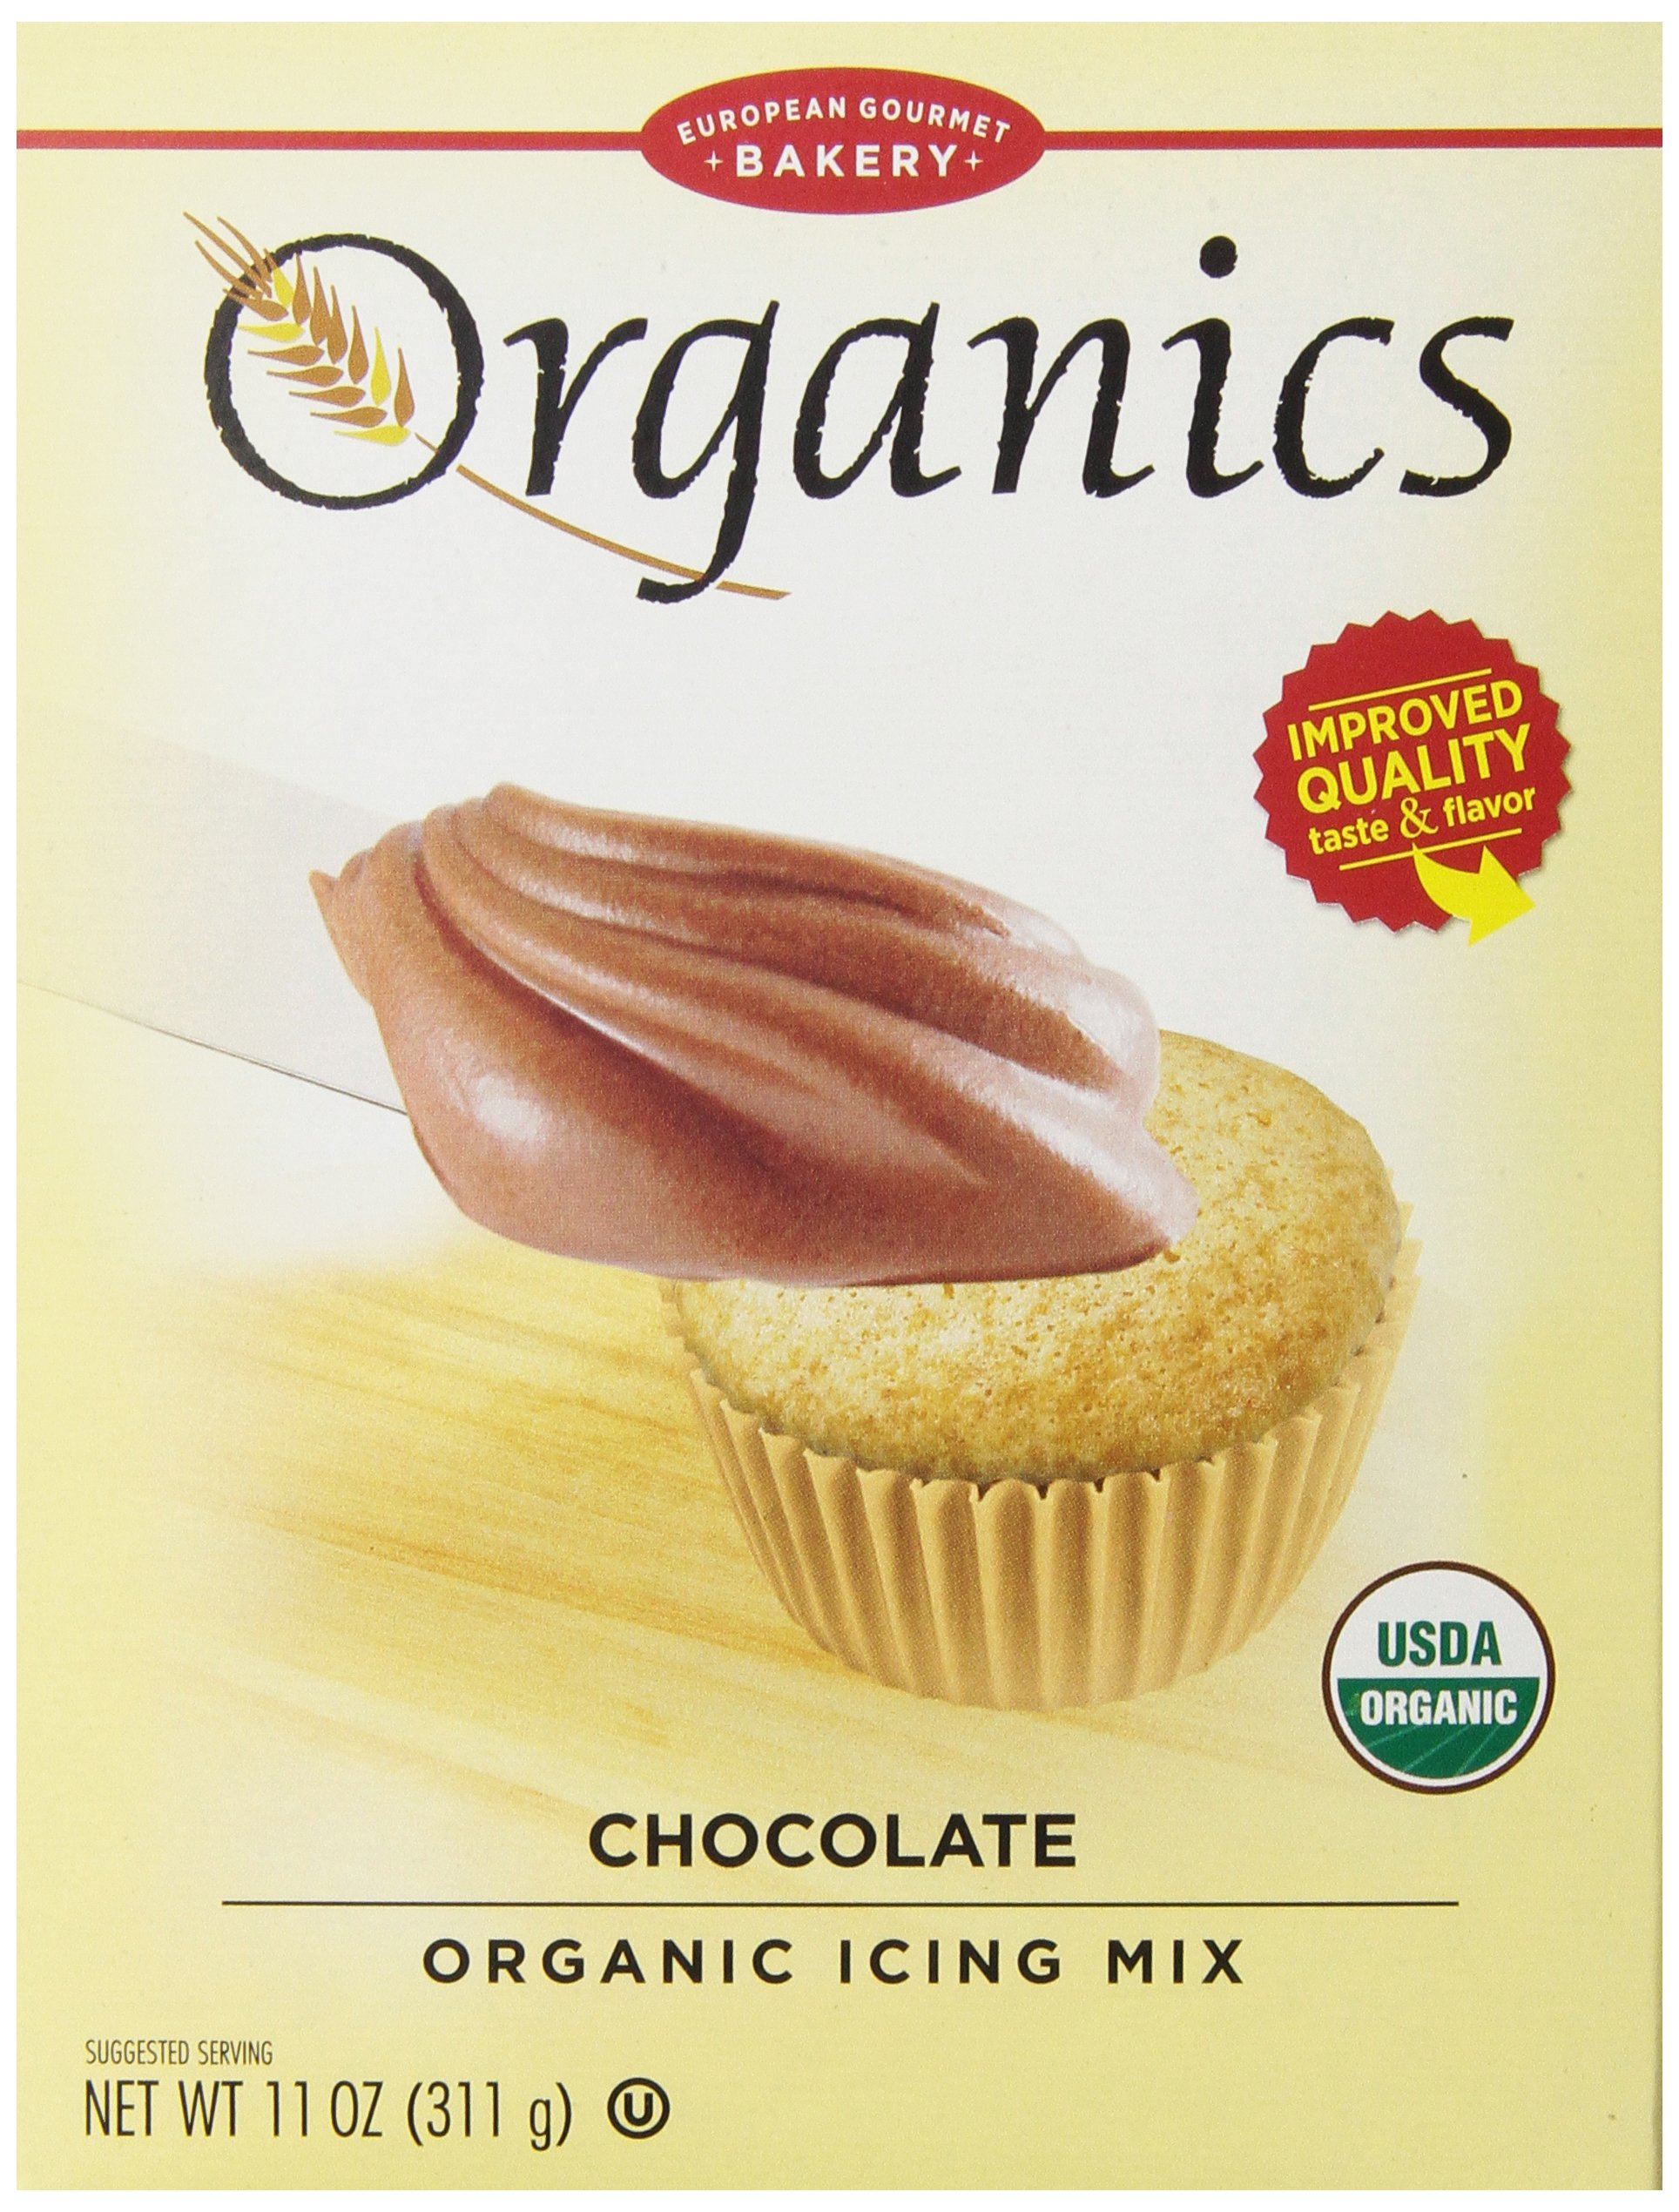 European Gourmet Bakery Organic Vanilla Cake